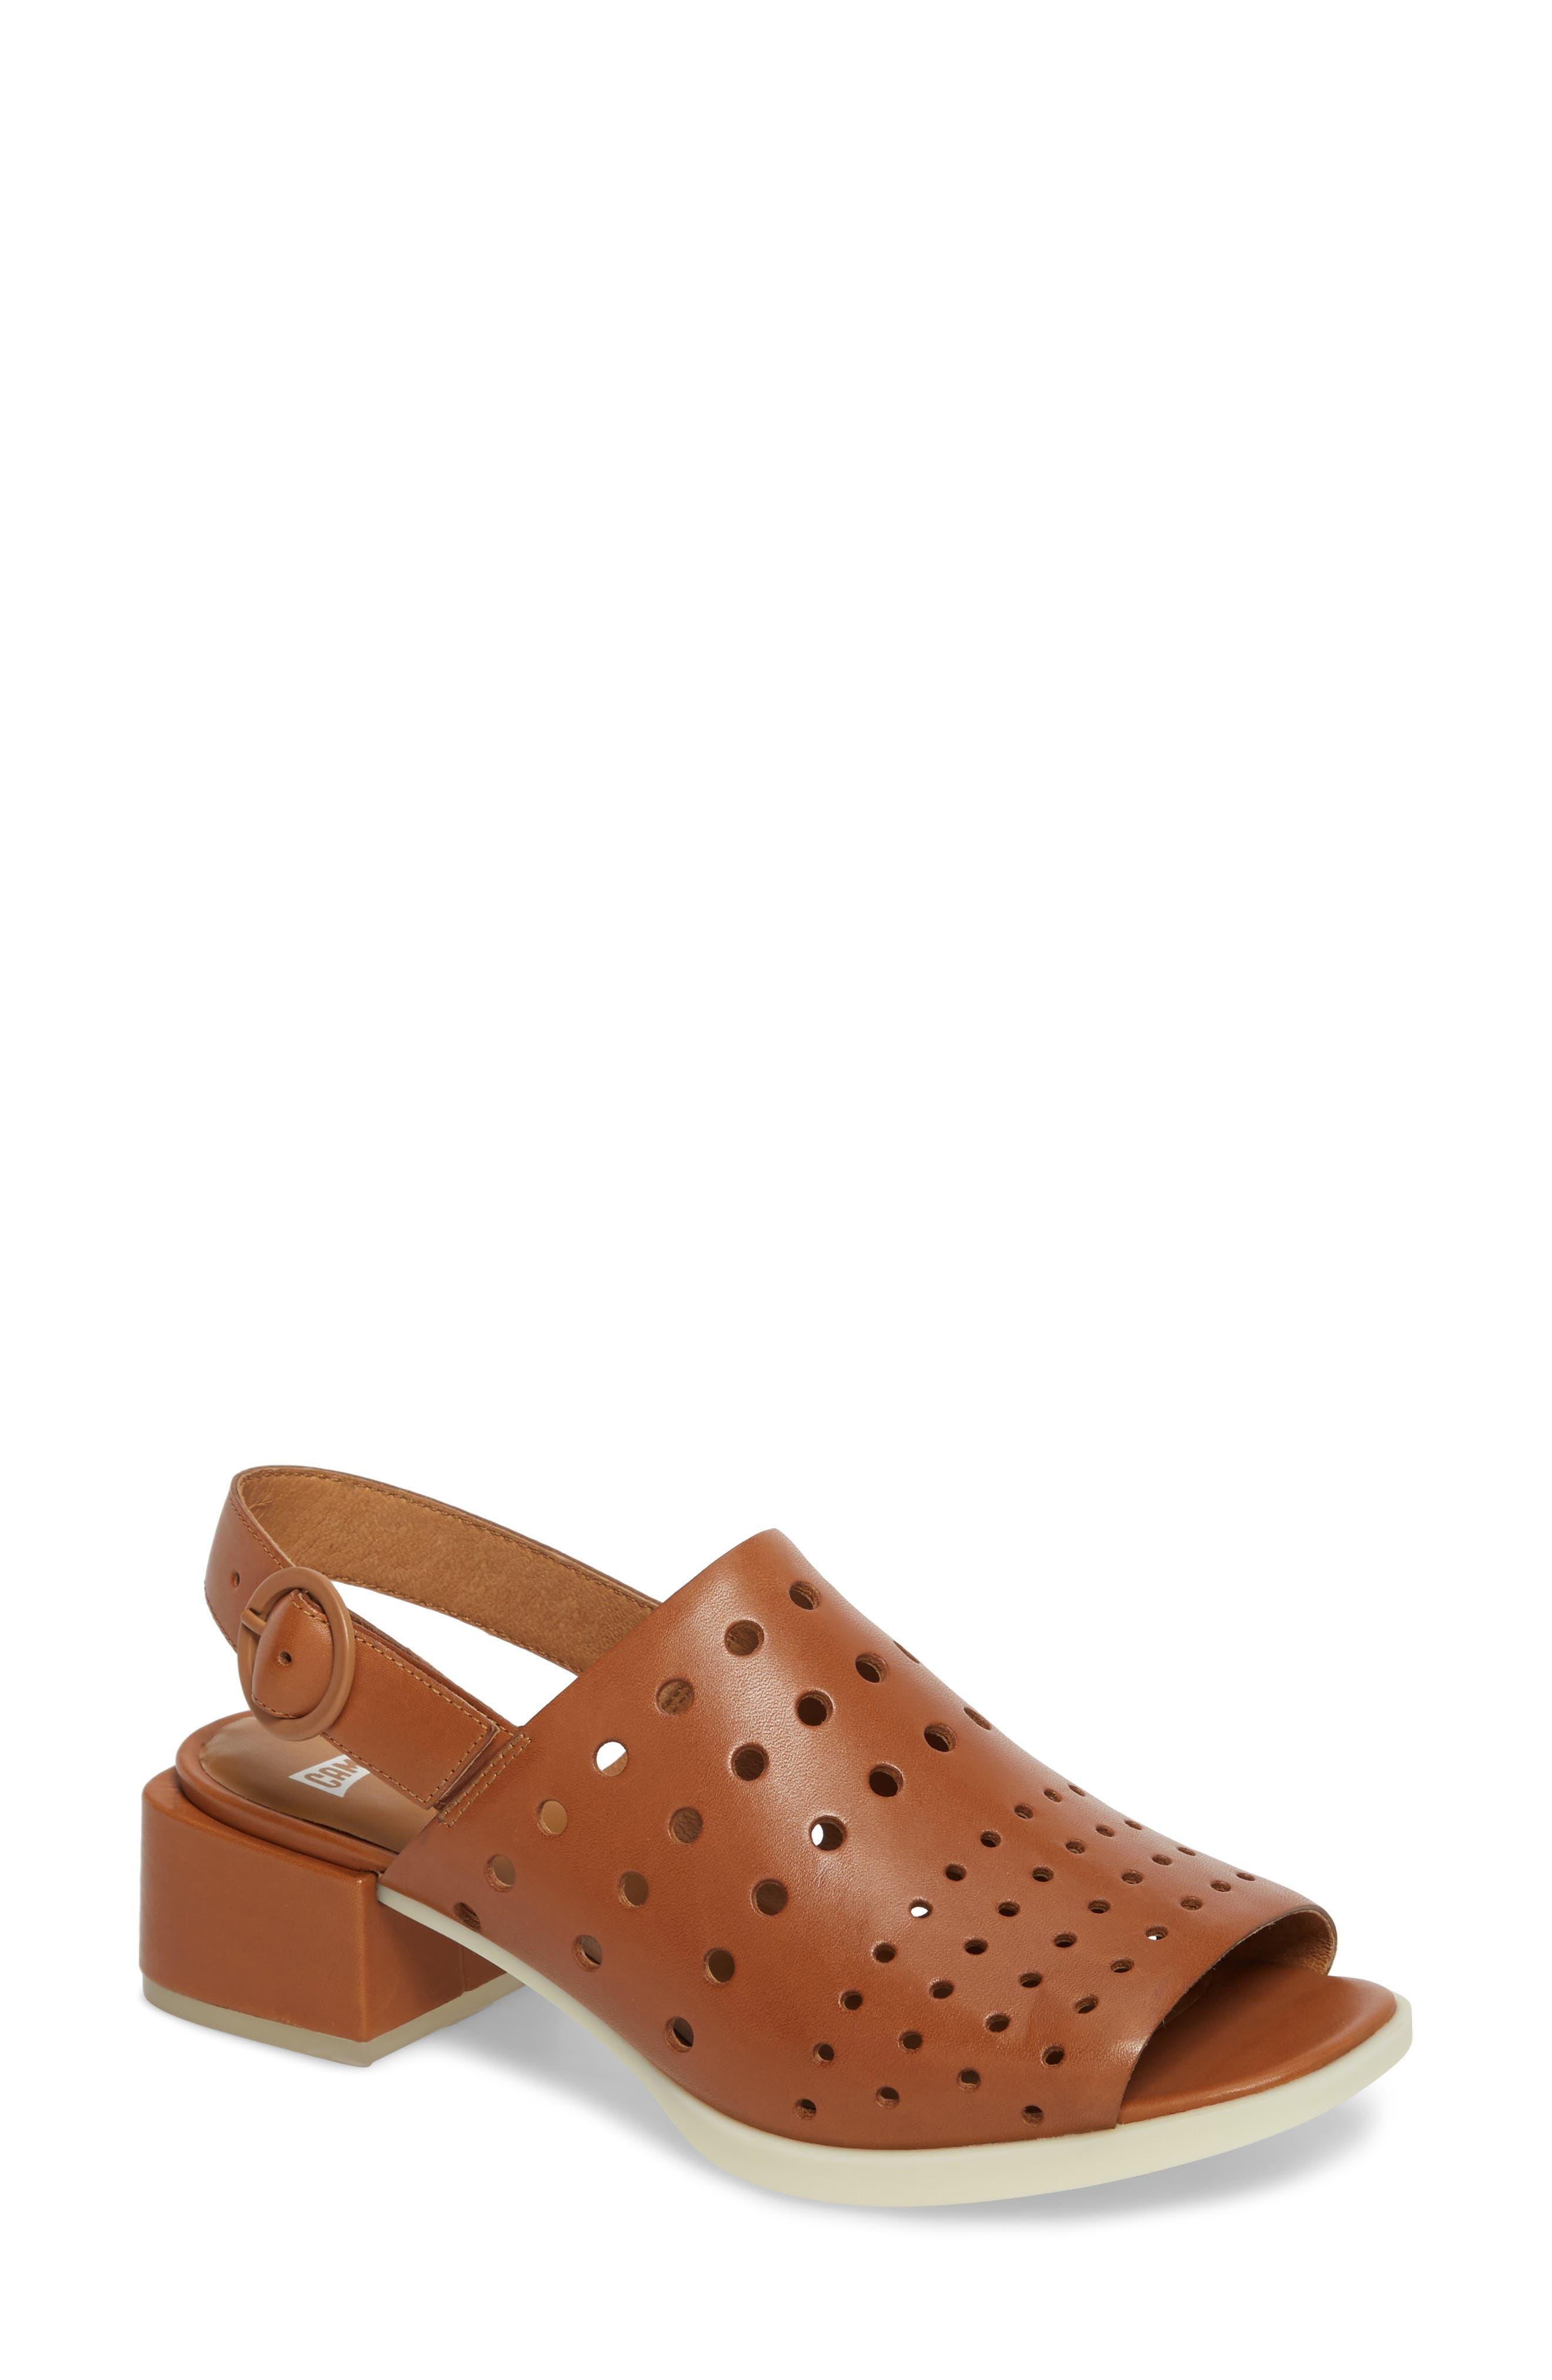 Twins Sandal,                             Main thumbnail 1, color,                             Rust/ Copper Leather